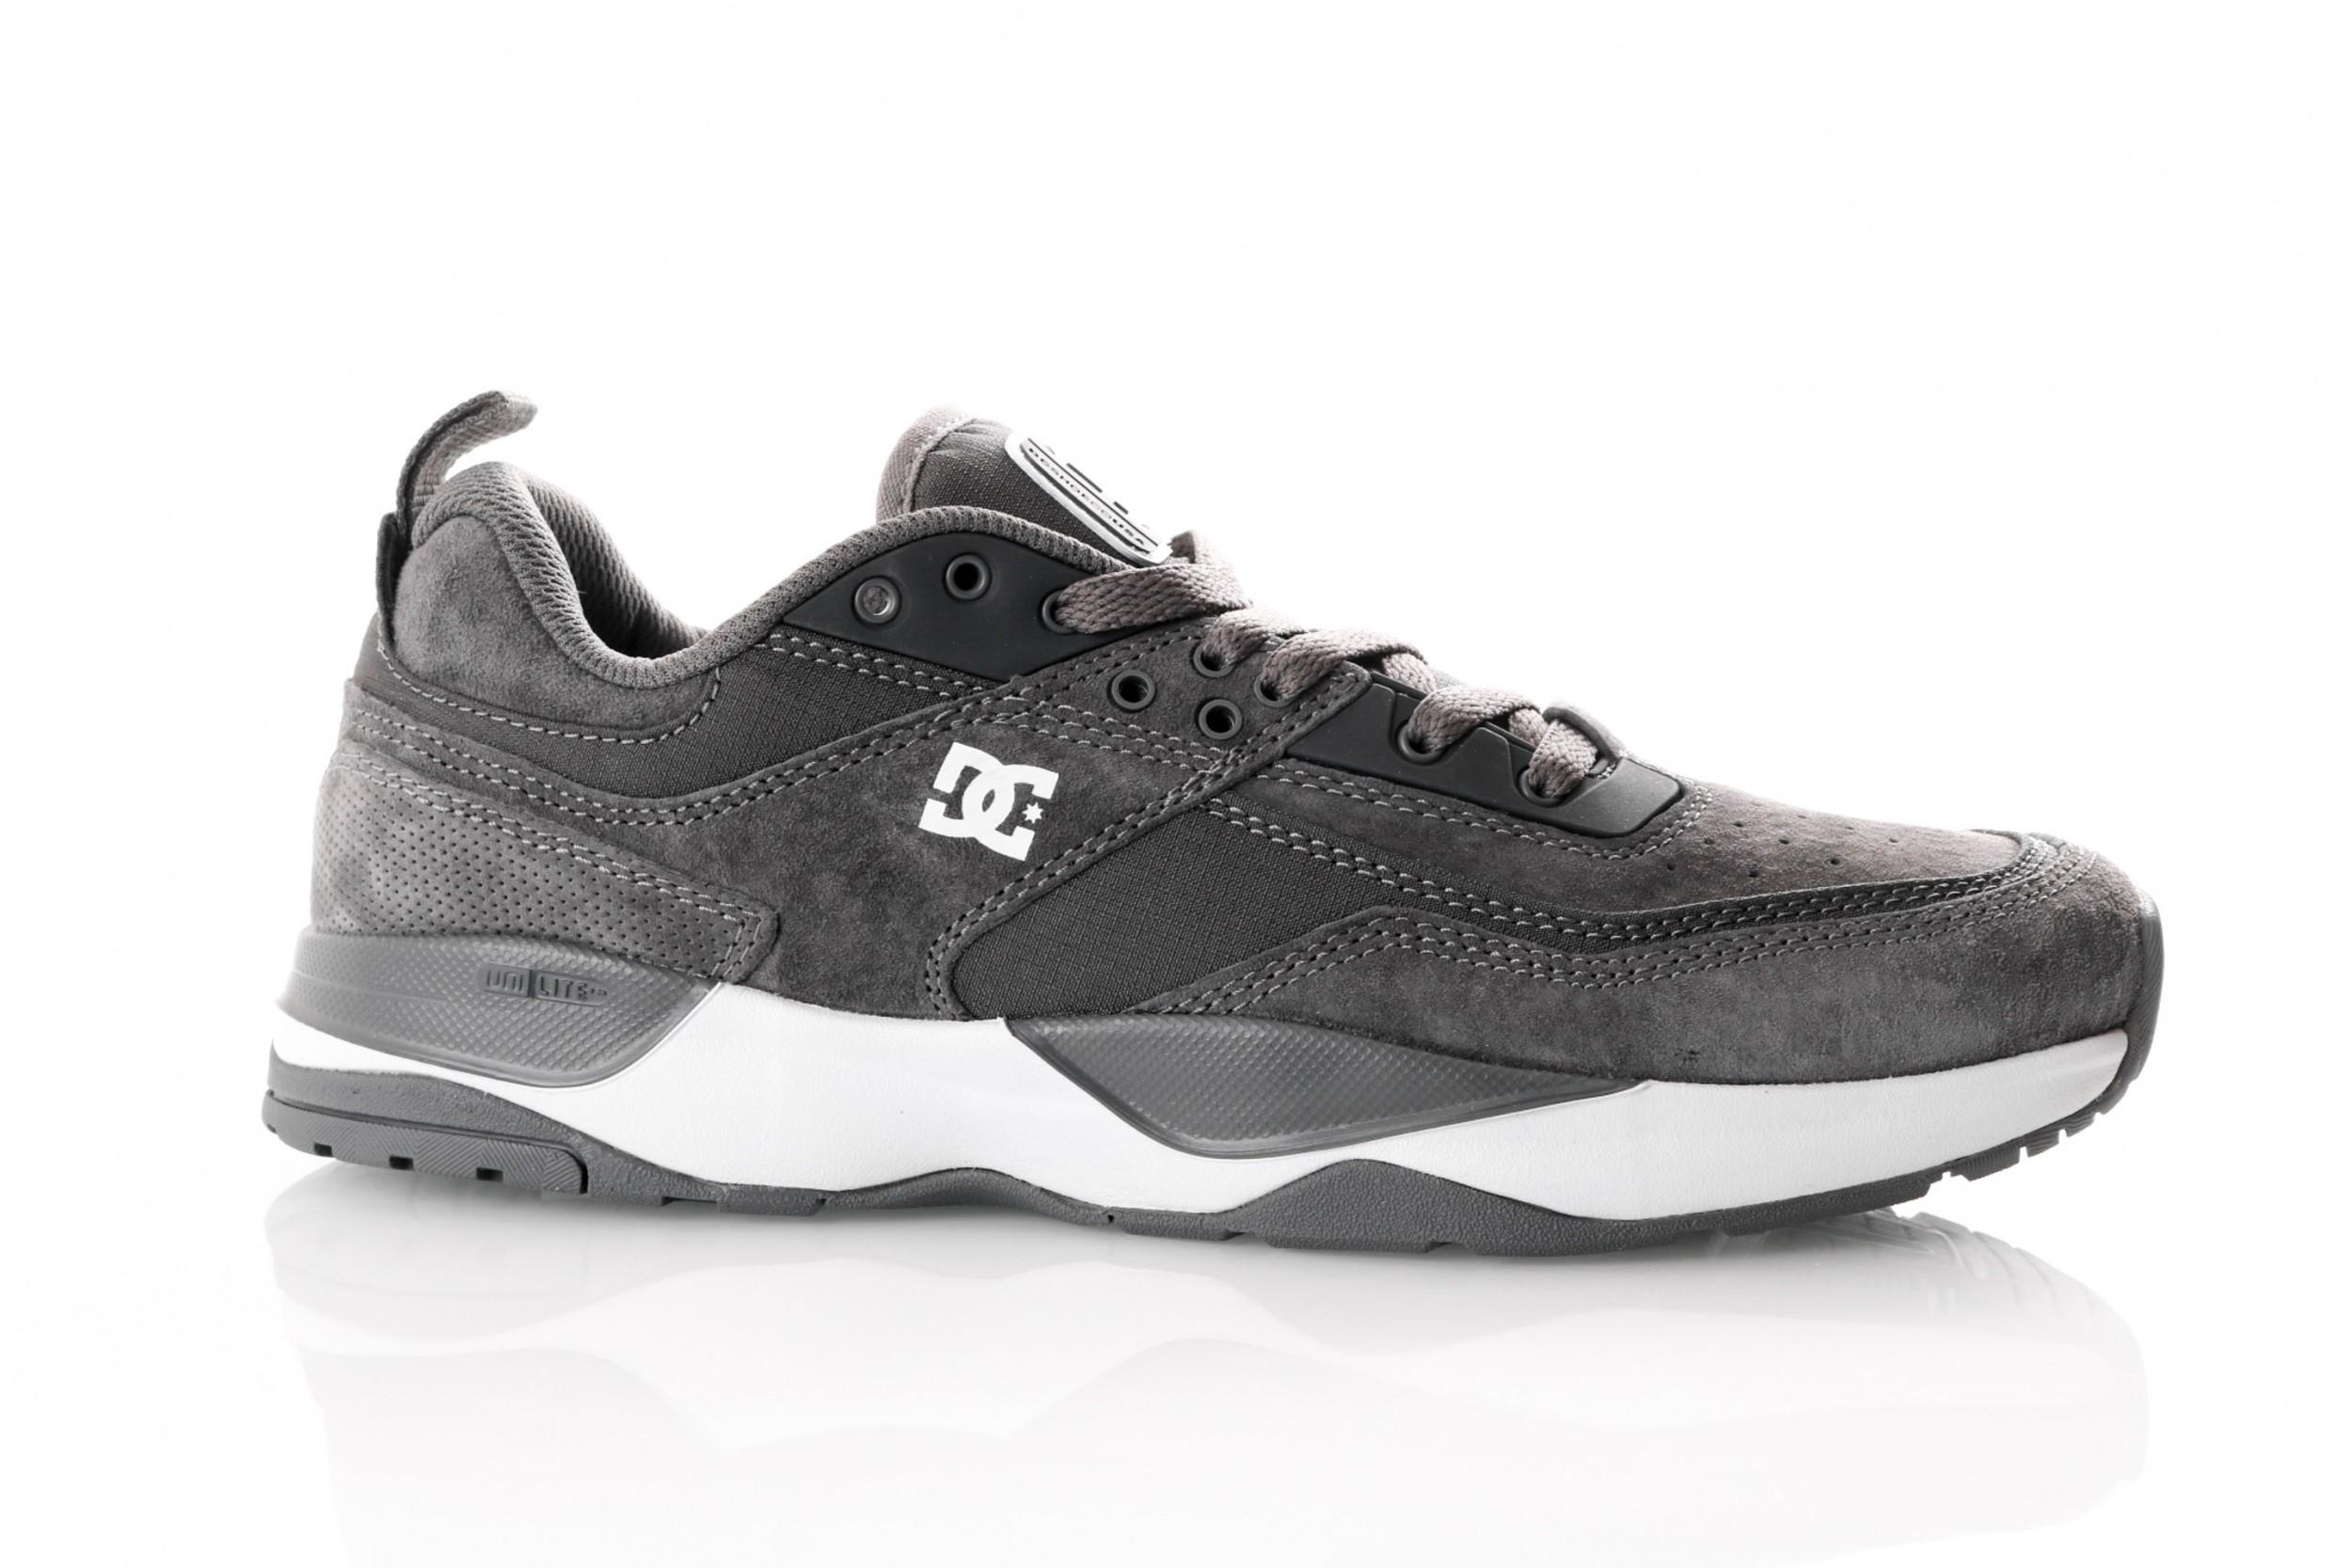 Foto van Dc E.Tribeka M Shoe Pew Adys700173-Pew Sneakers Pewter